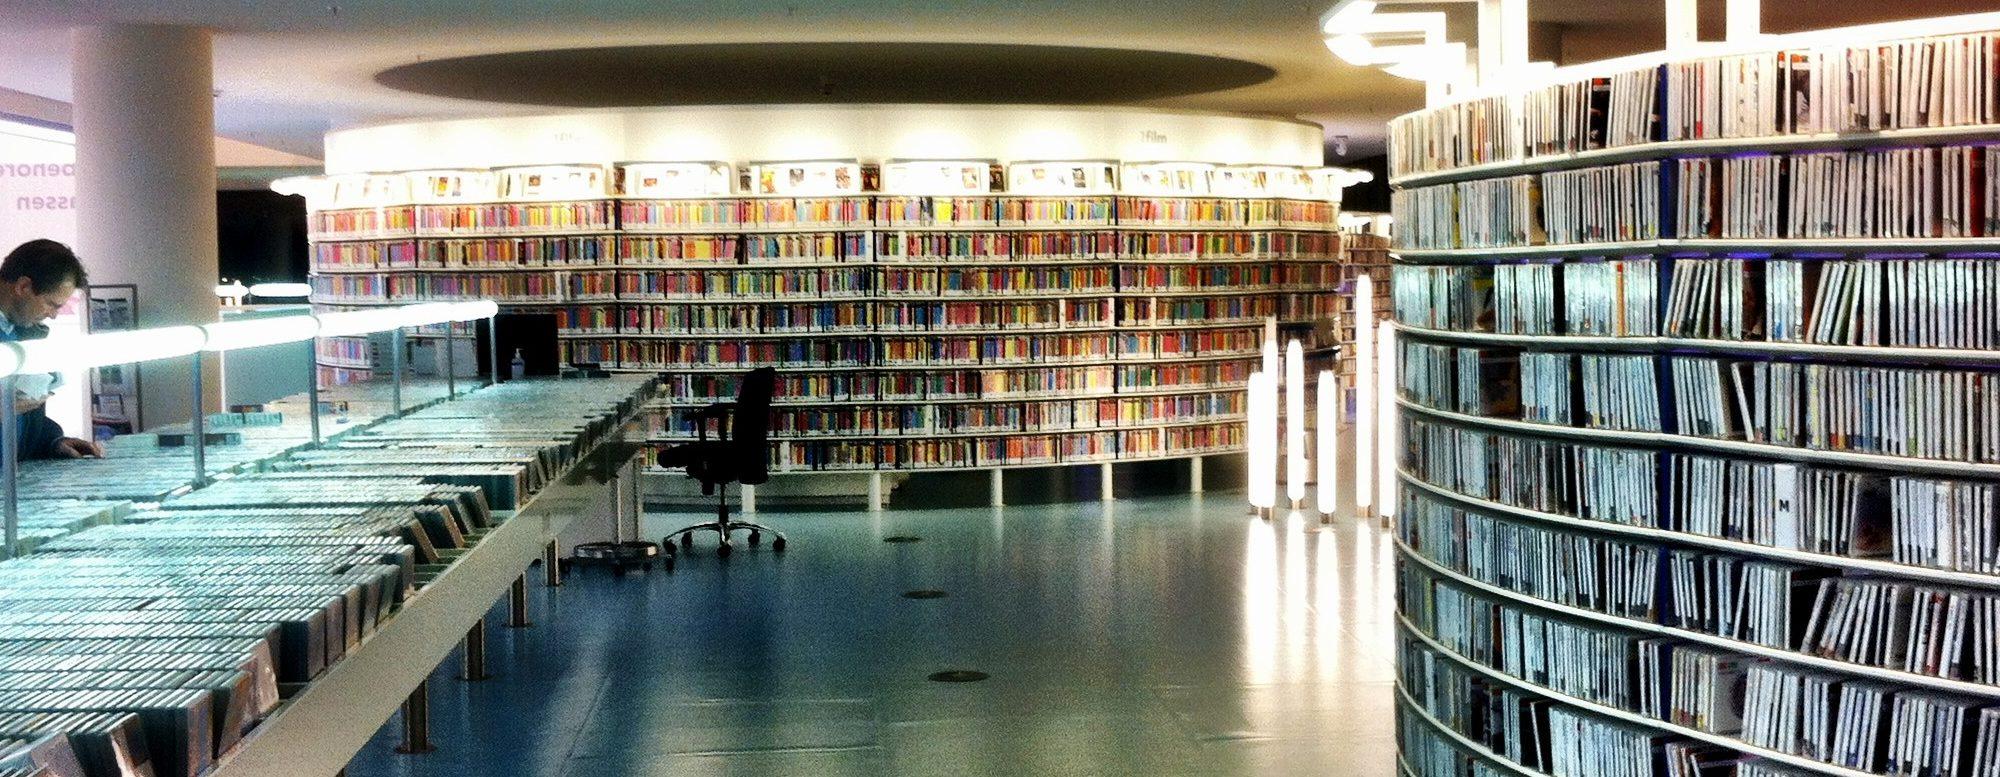 Media library by Taras Kalapun / flickr / CC-BY 2.0